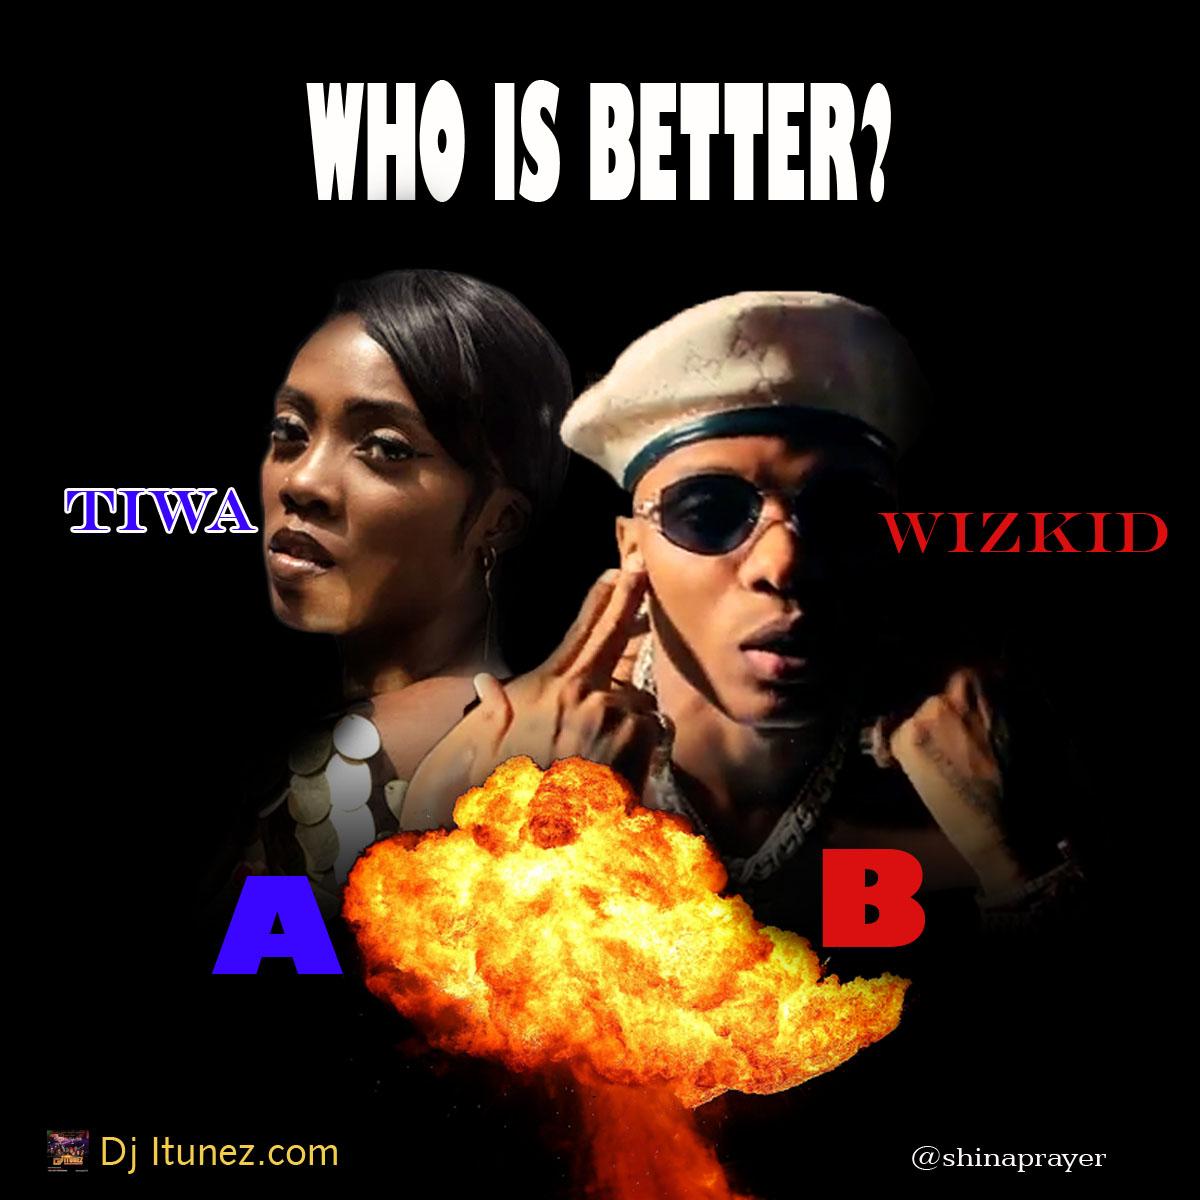 Wizkid Or Tiwa Savage -www.djitunez.com